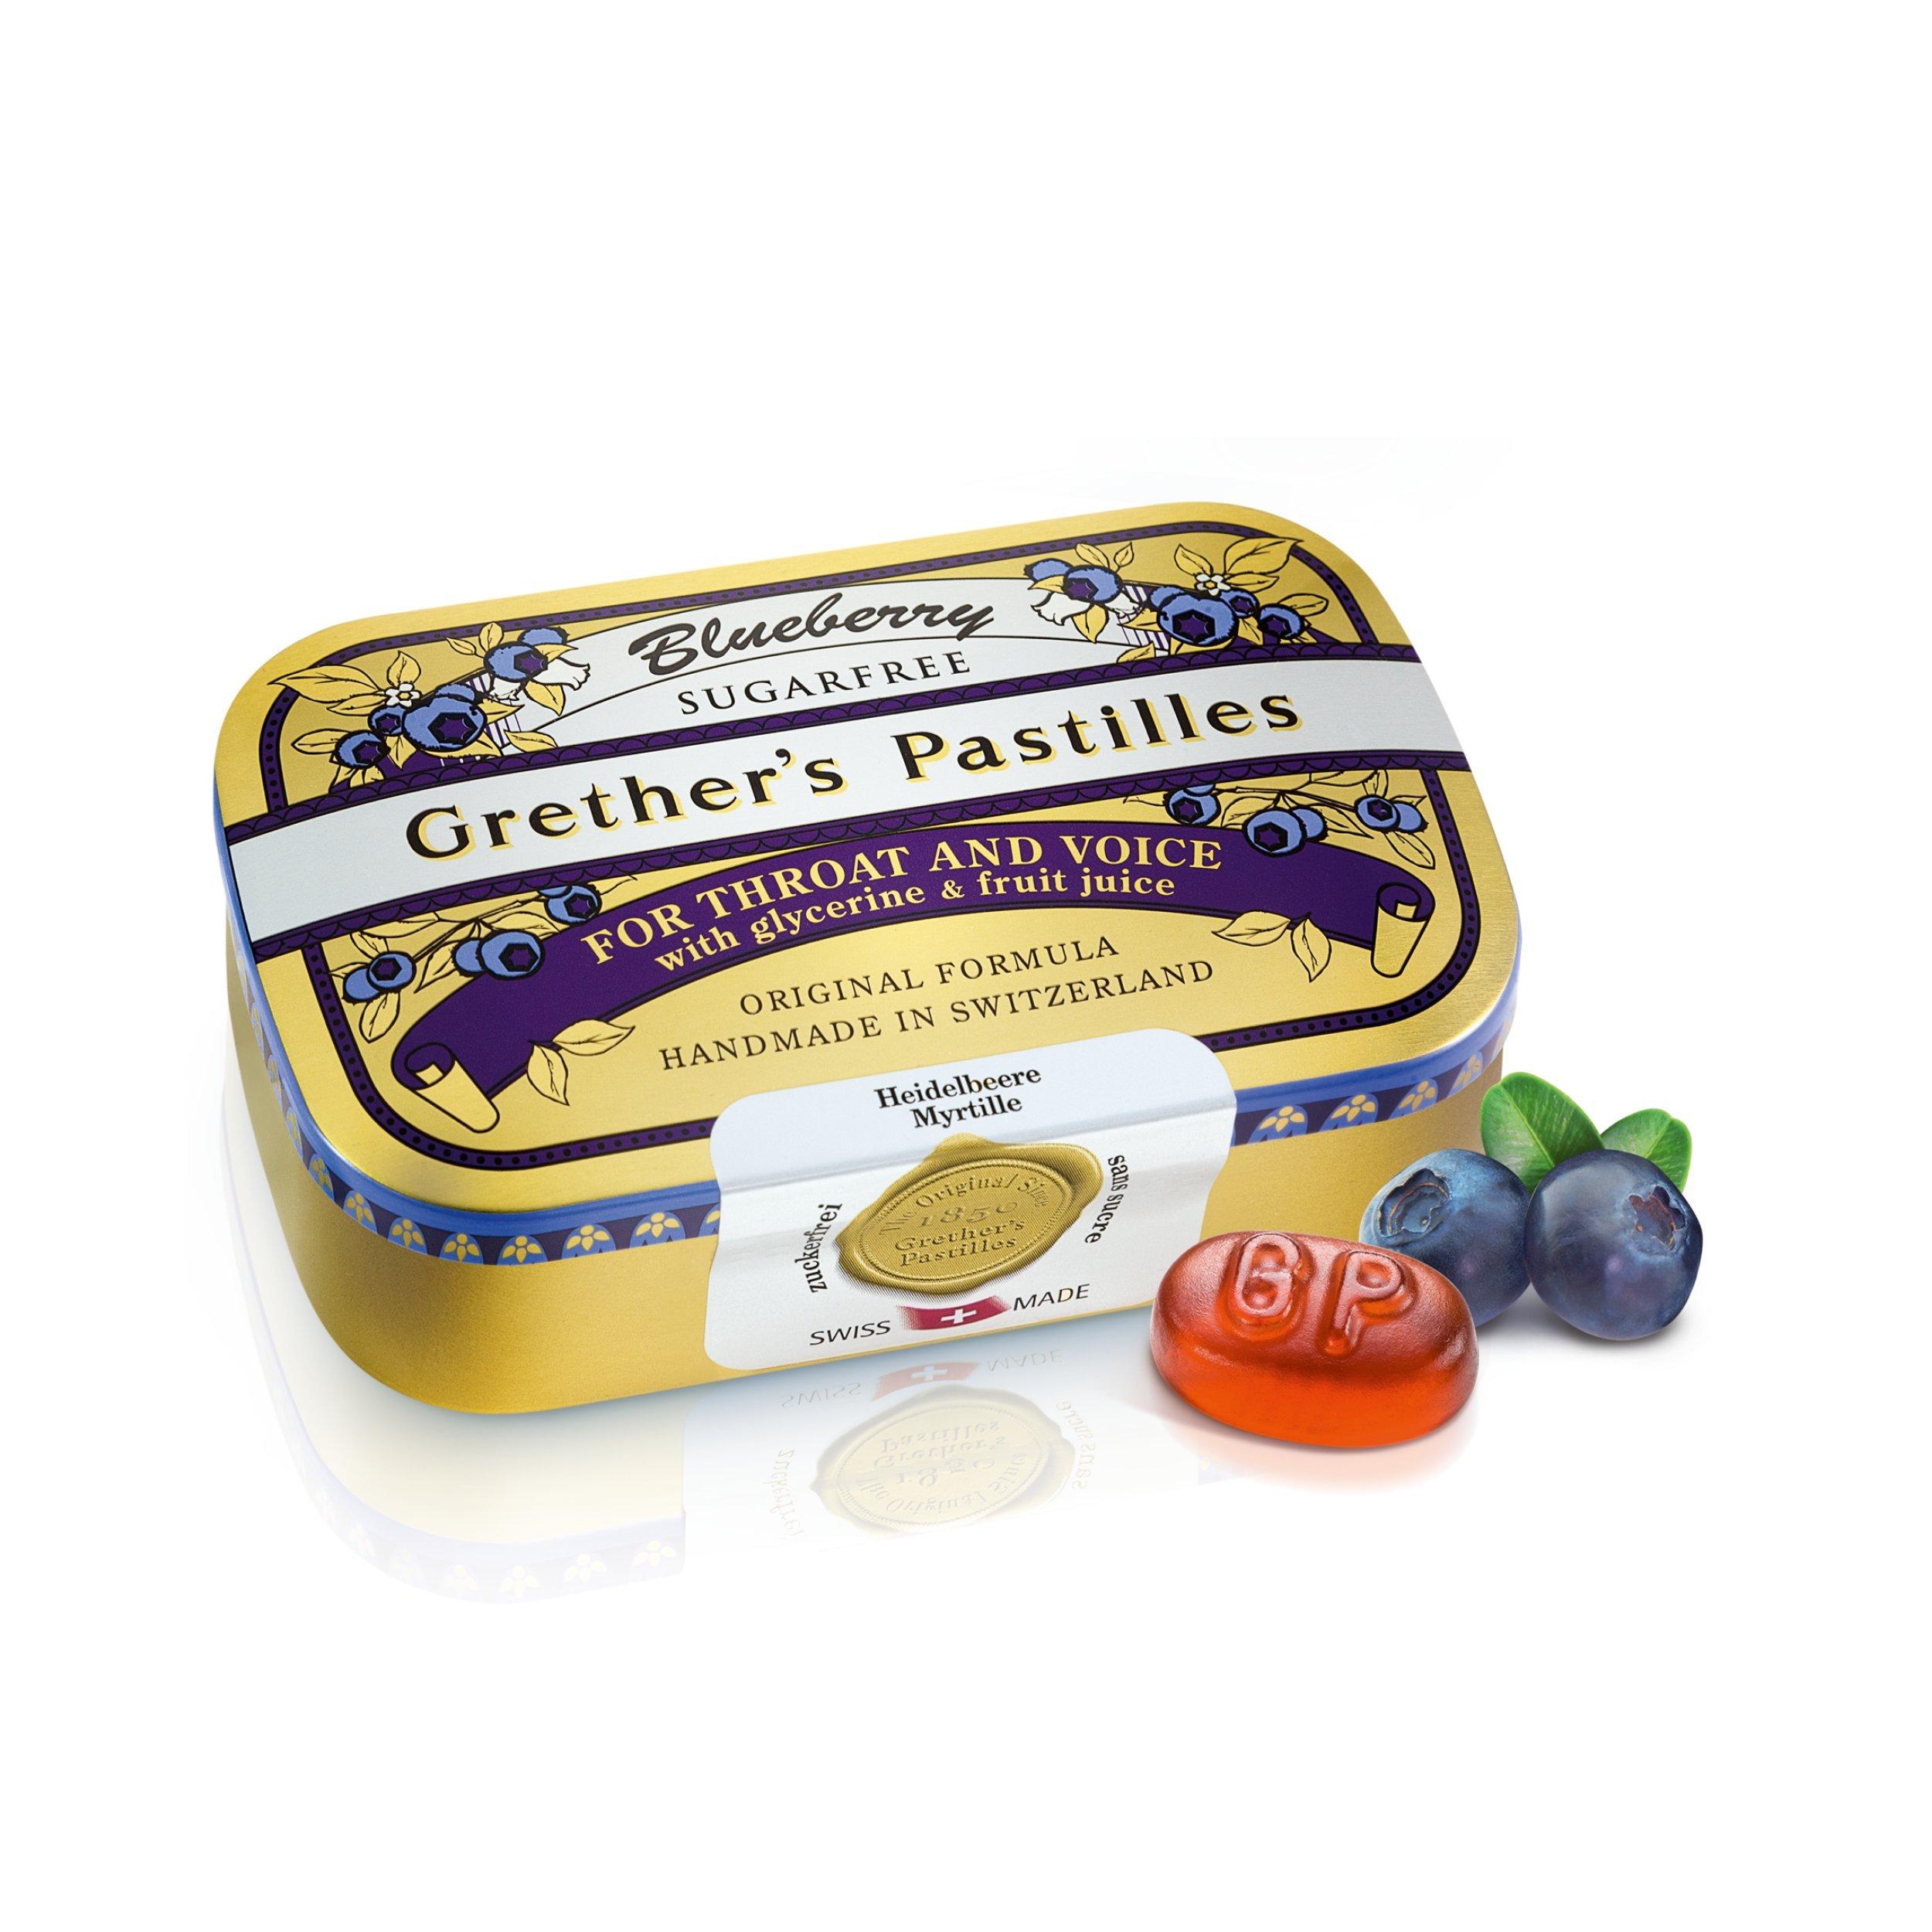 GRETHER'S PASTILLES Blueberry Sugar Free 110G/3.75OZ